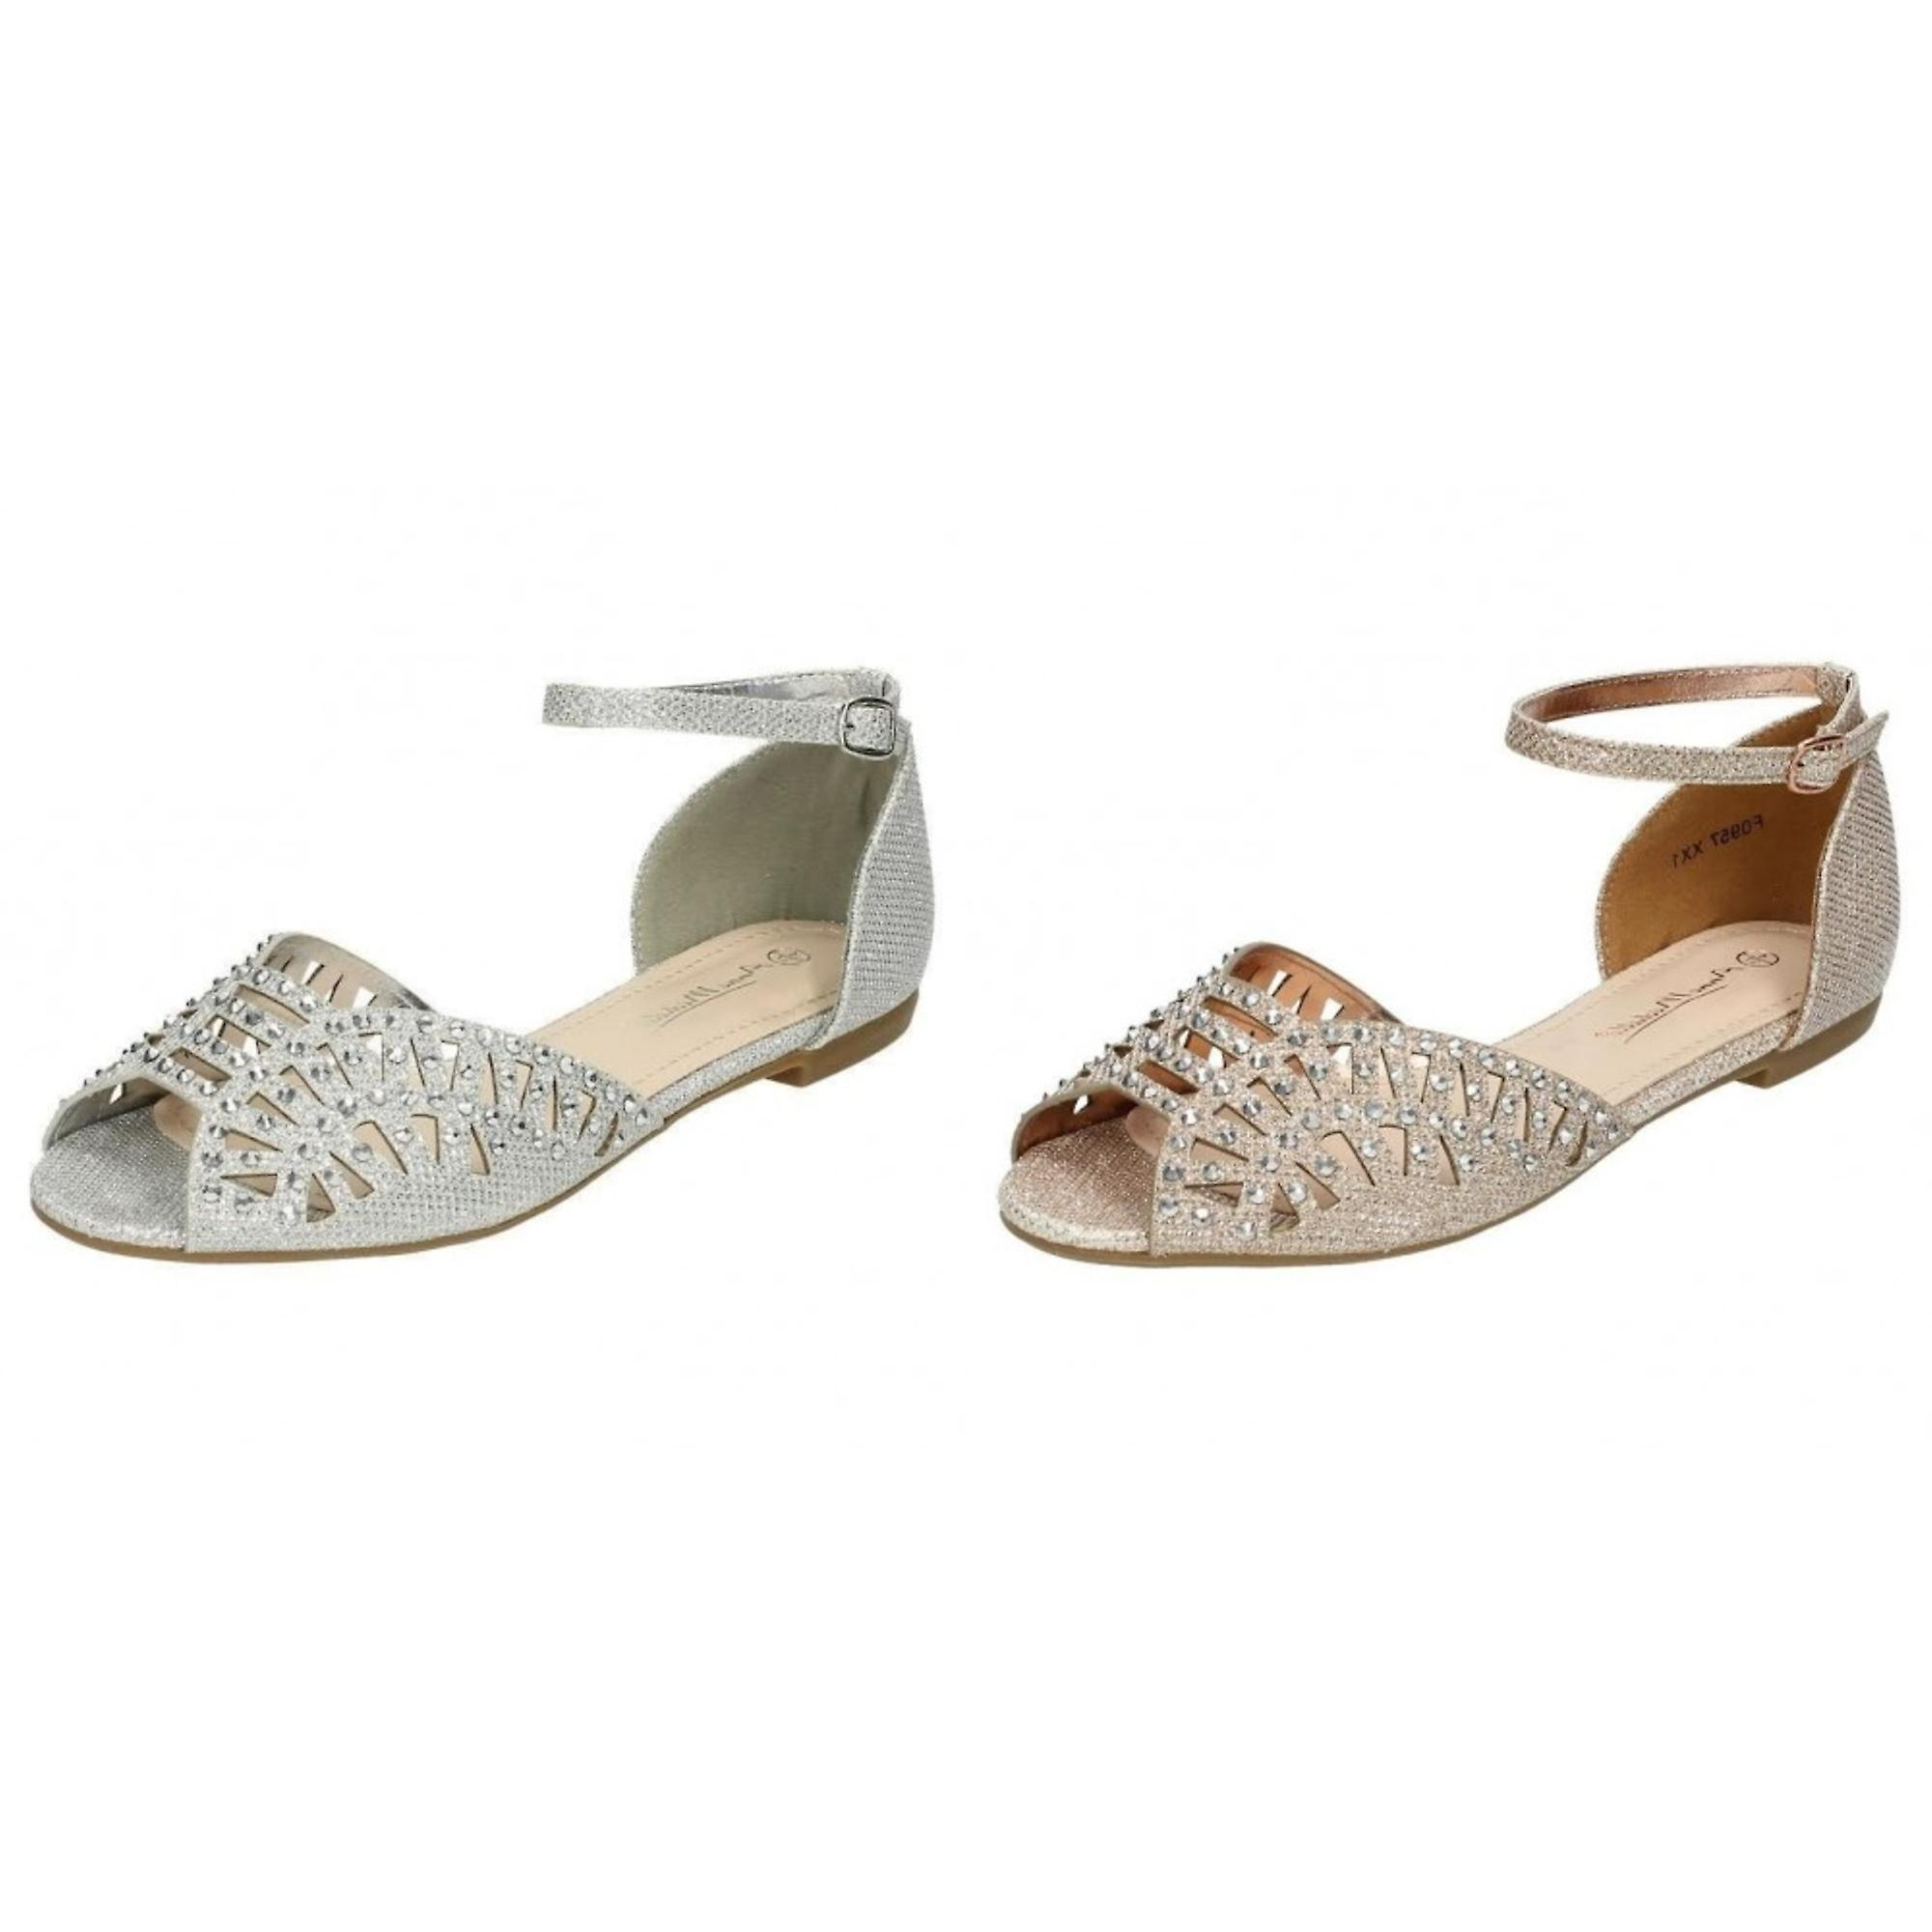 Anne Michelle Womens/Ladies Diamante Trim Peep Toe Sandals DWCOt